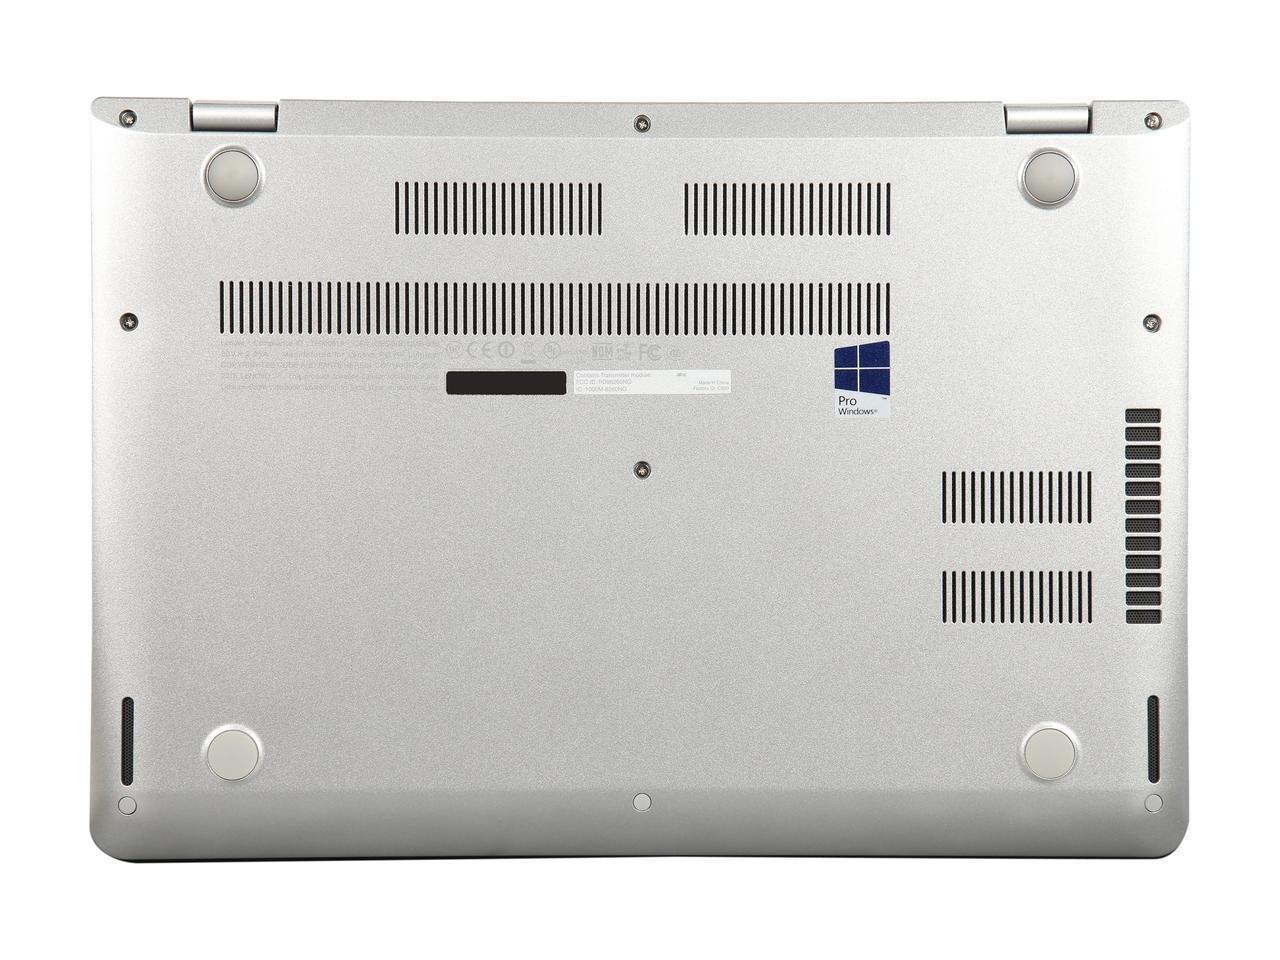 2018 Lenovo ThinkPad 13 13.3'' HD Business Laptop Computer, Intel Core i5-6200U up to 2.80GHz, 8GB DDR4 RAM, 256GB SSD, USB Type-C, HDMI, 802.11ac, Bluetooth 4.1, Windows 7 Professional